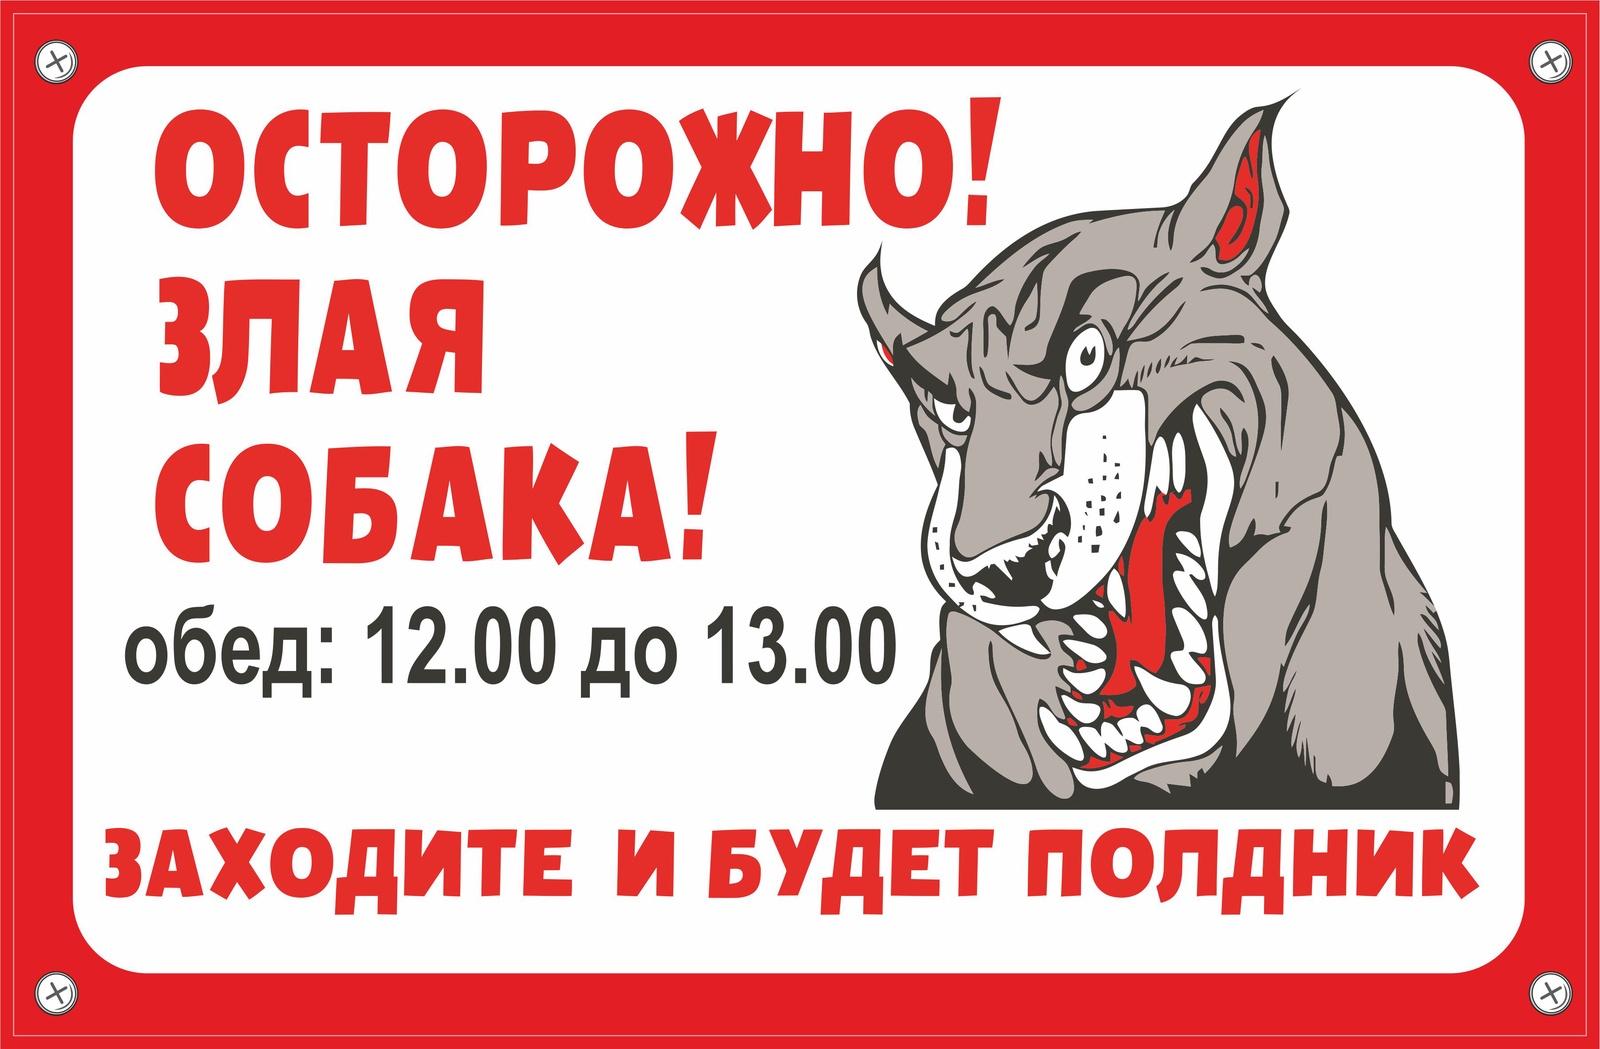 Табличка Mashinokom Собака полдник TPS 001, белый, красный, 30*19,5 см табличка mashinokom моя территория tpo 006